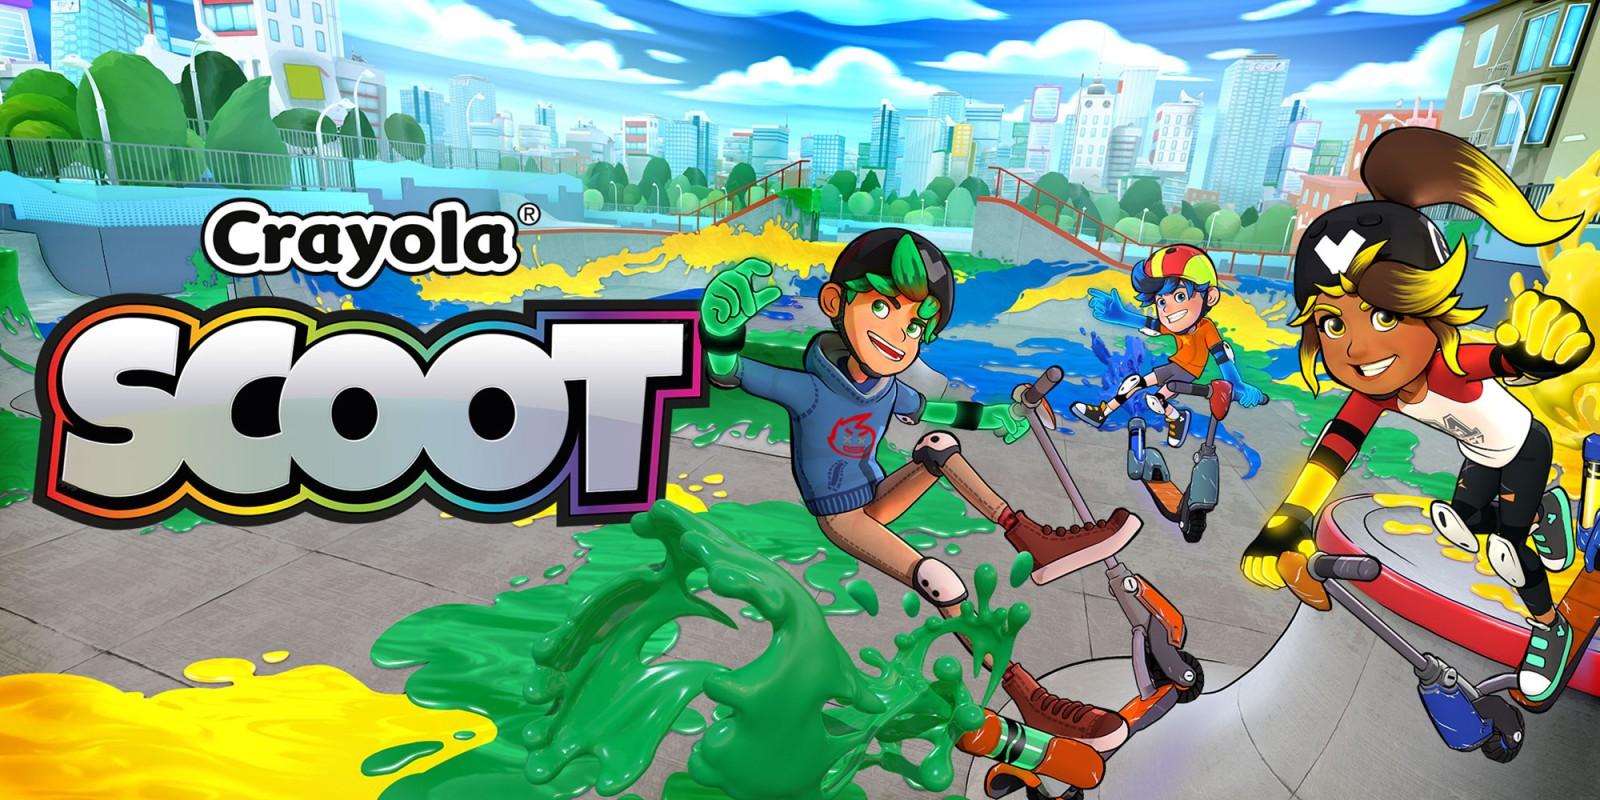 Crayola Scoot Nintendo Switch Games Nintendo